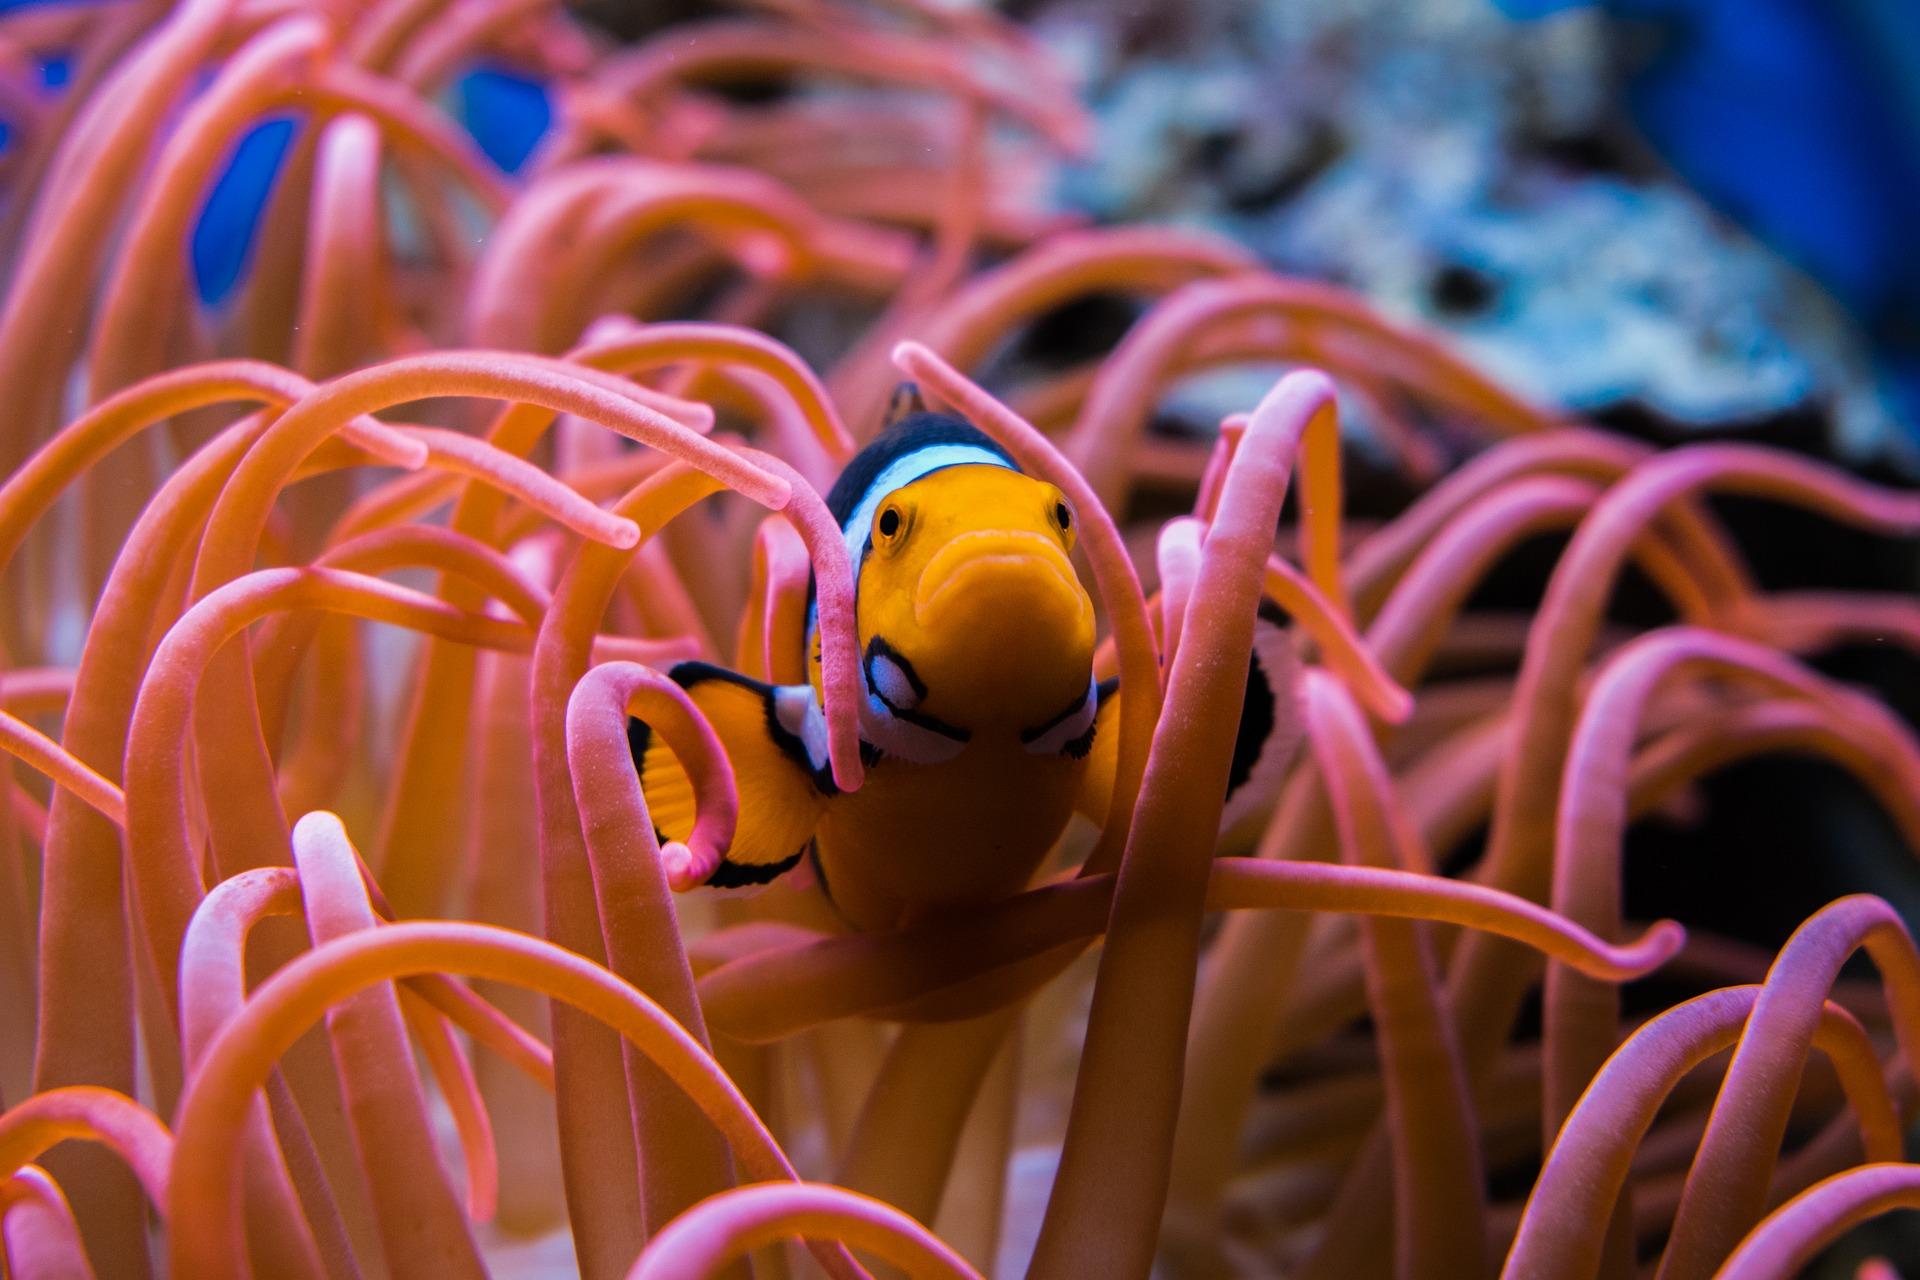 clownfish-3030148_1920.jpg